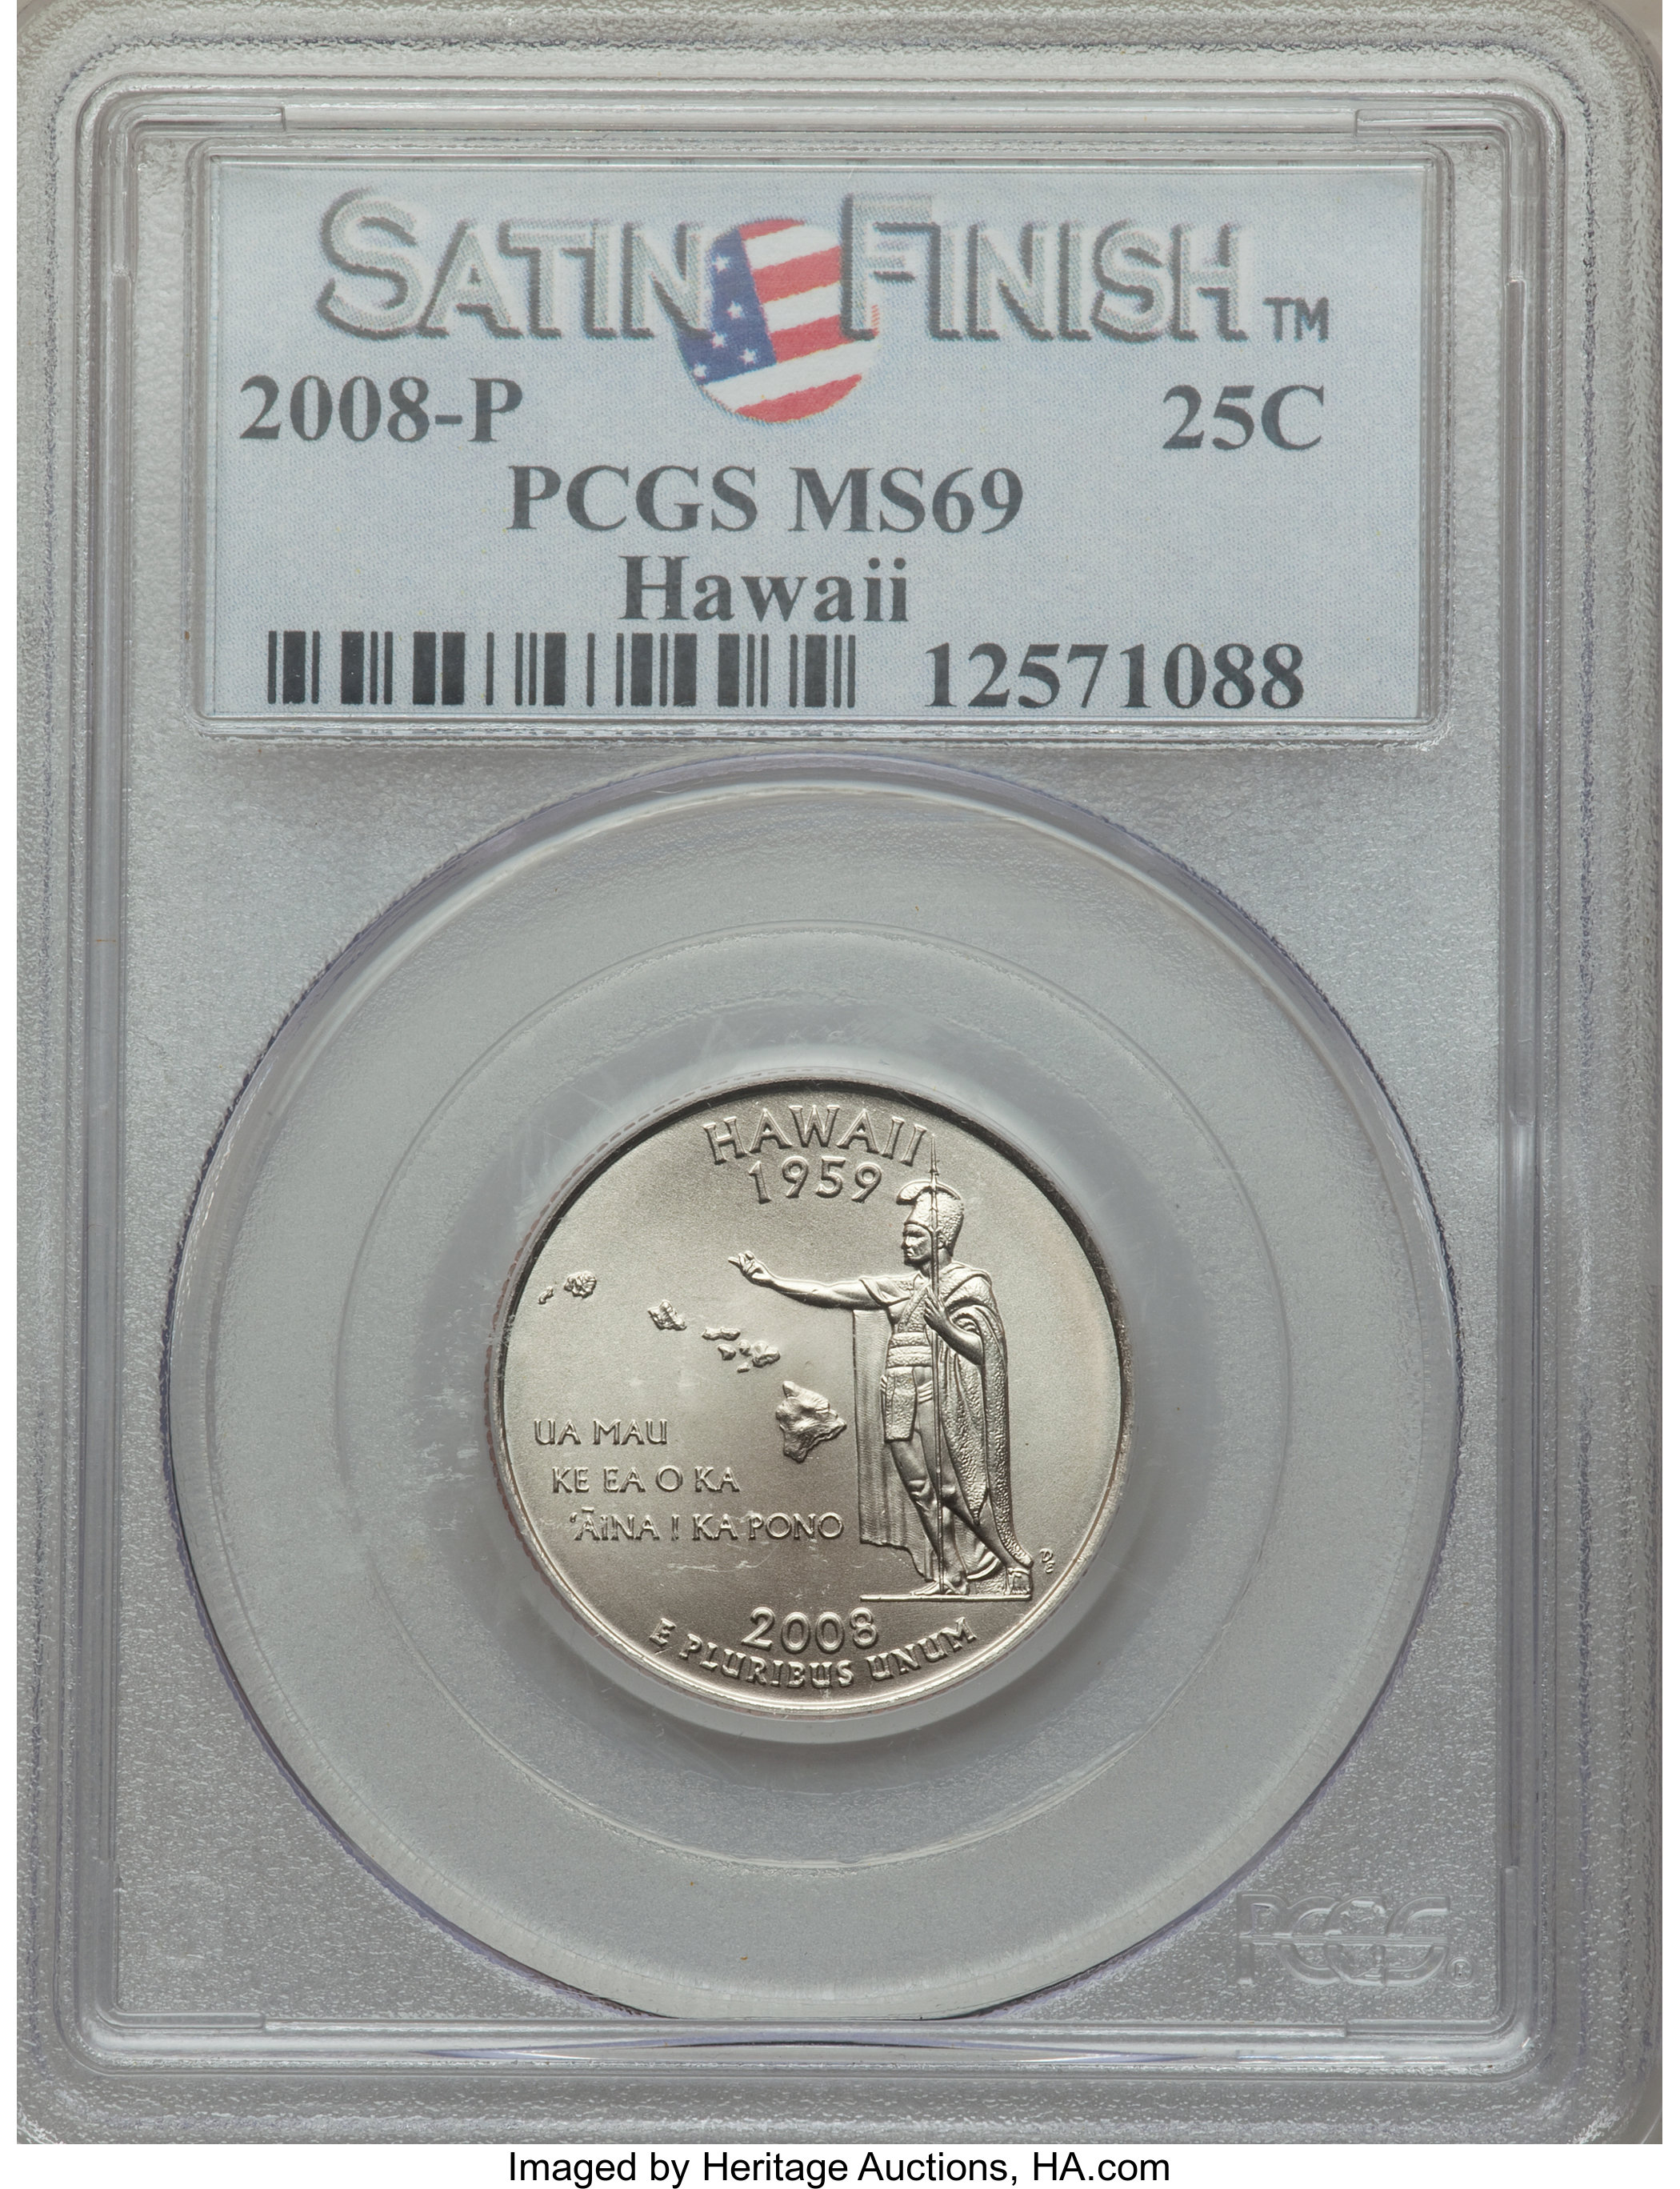 sample image for 2008-P Hawaii 25c SP Satin Finish